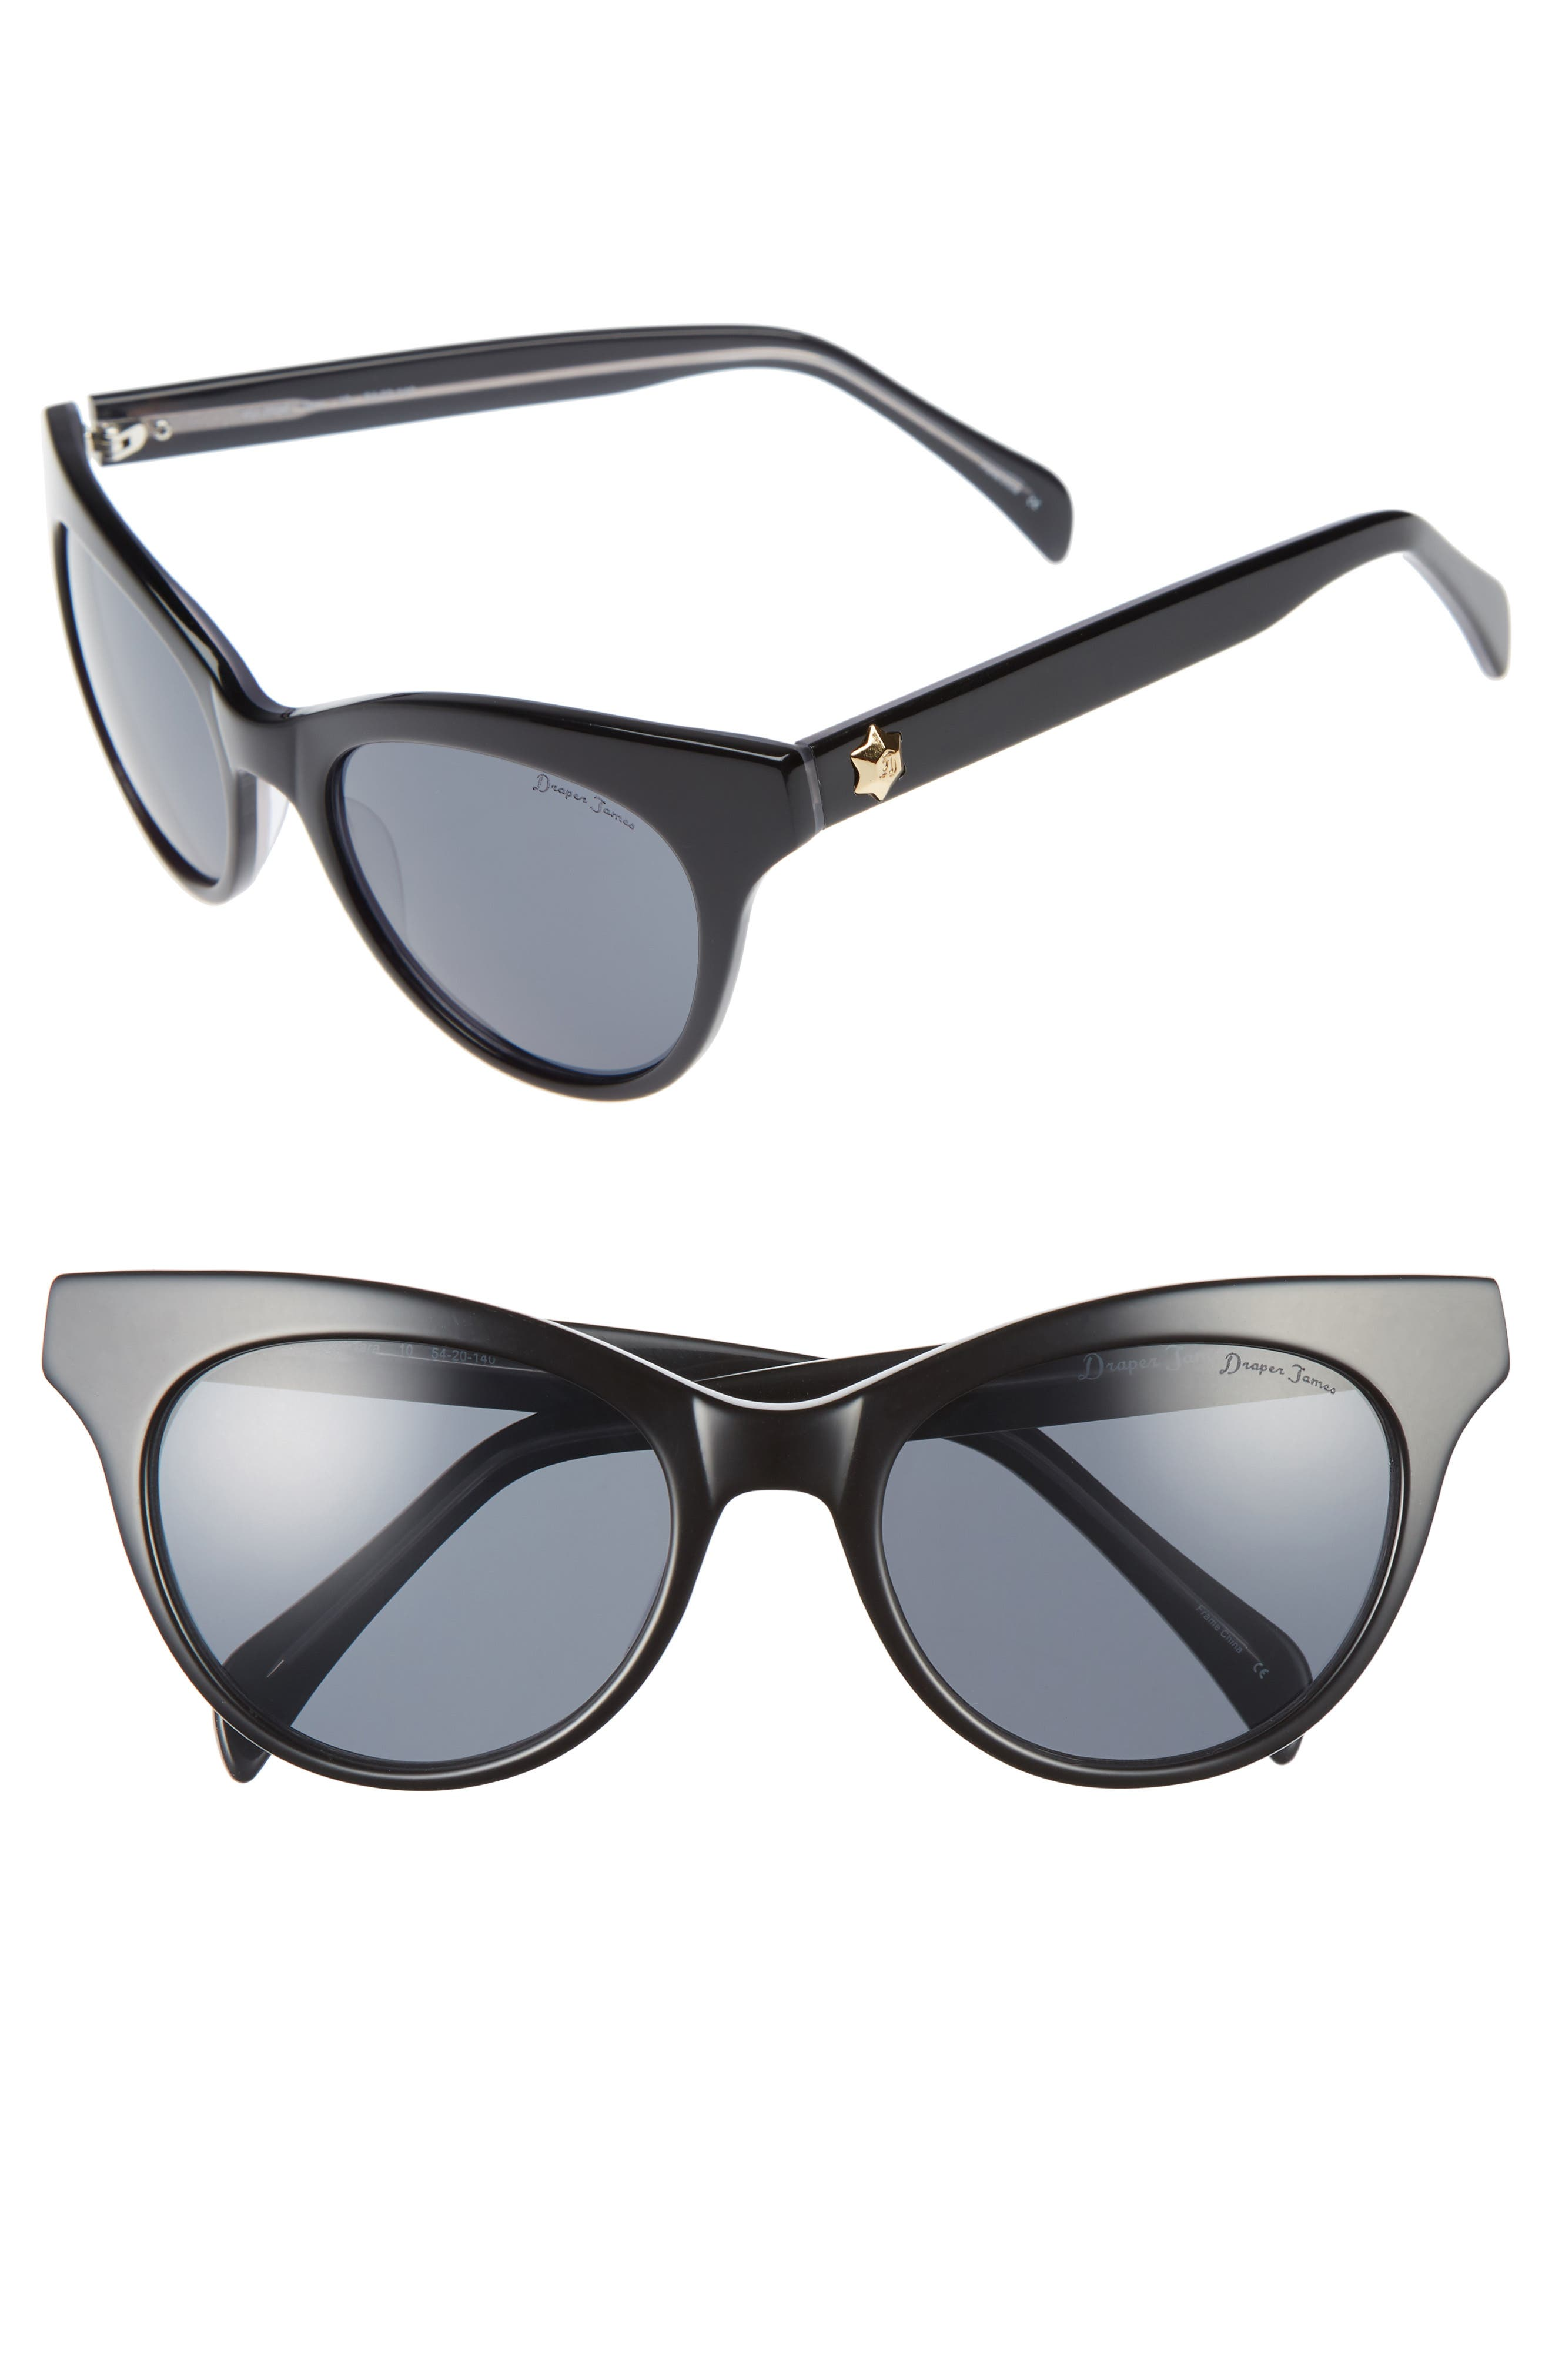 54mm Gradient Lens Cat Eye Sunglasses,                             Main thumbnail 1, color,                             001